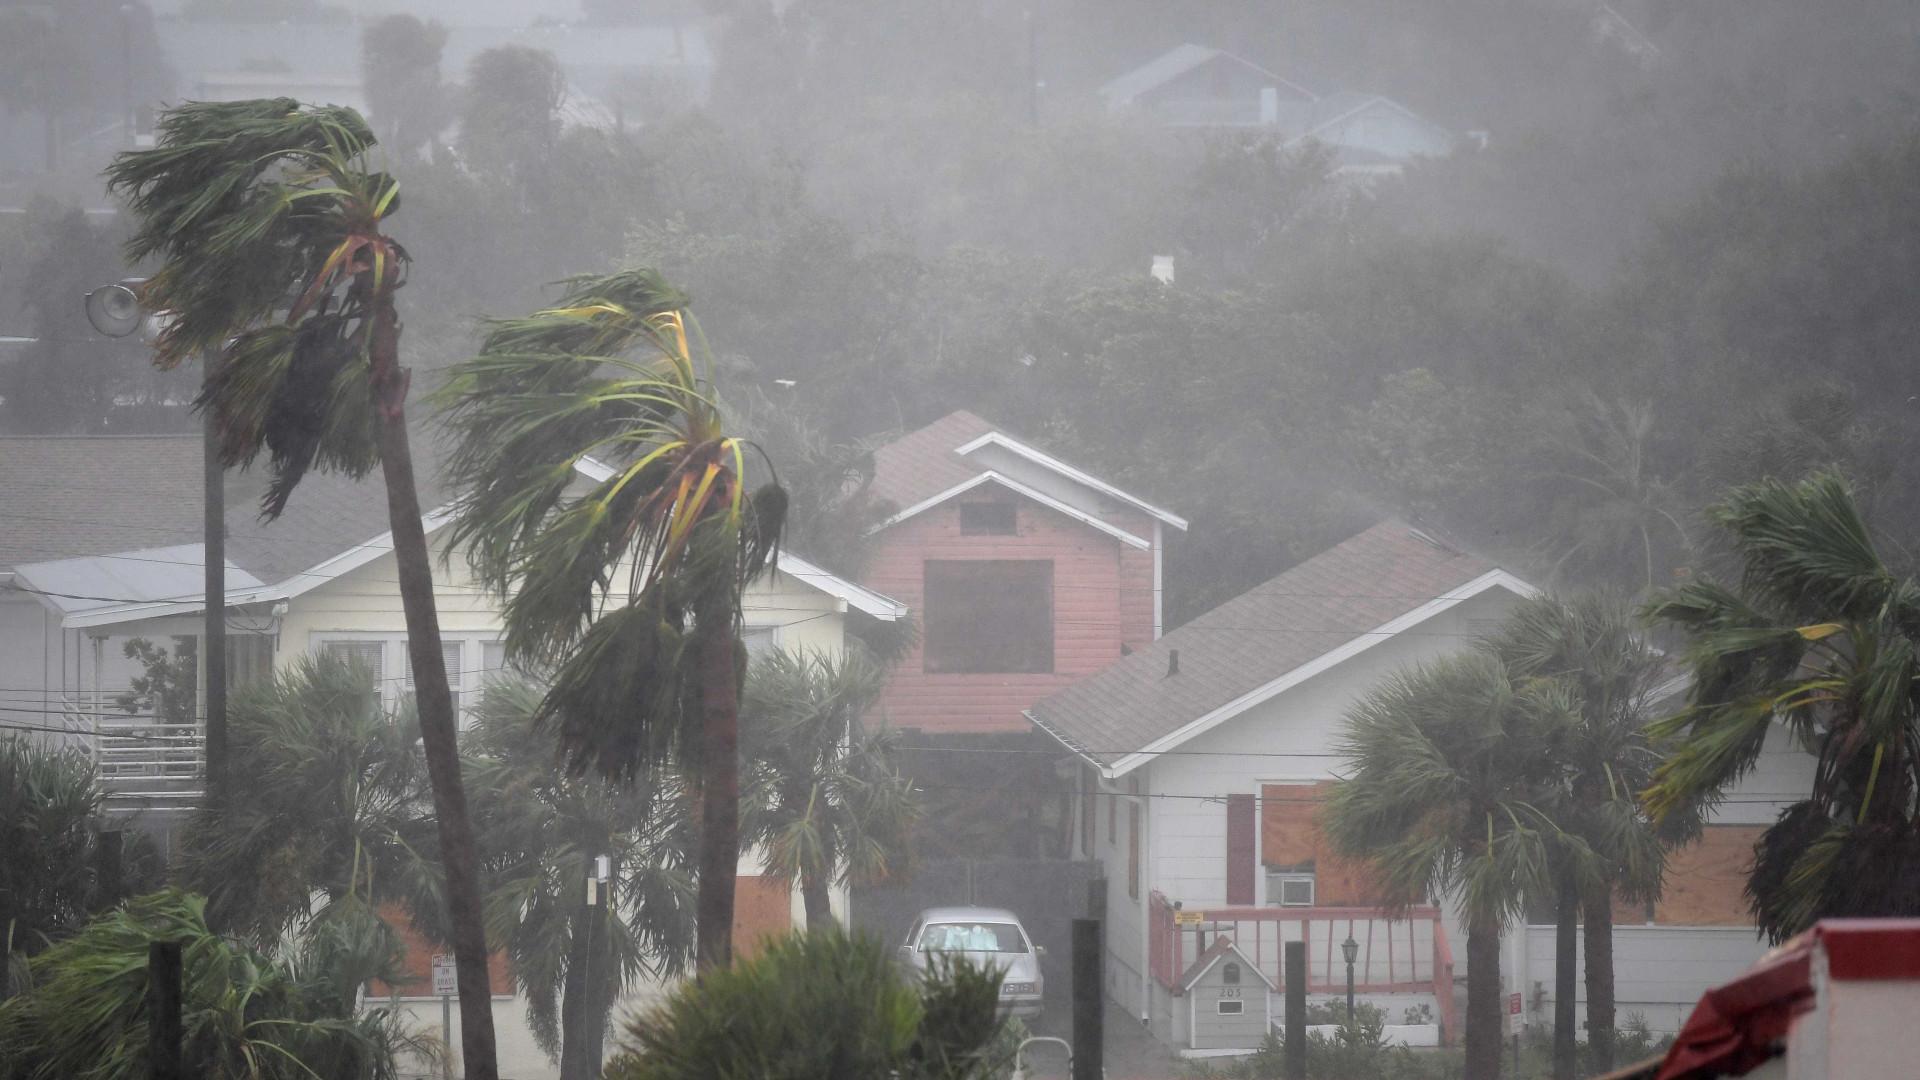 Ainda se recuperando, Santa Catarina passa por novo ciclone na terça